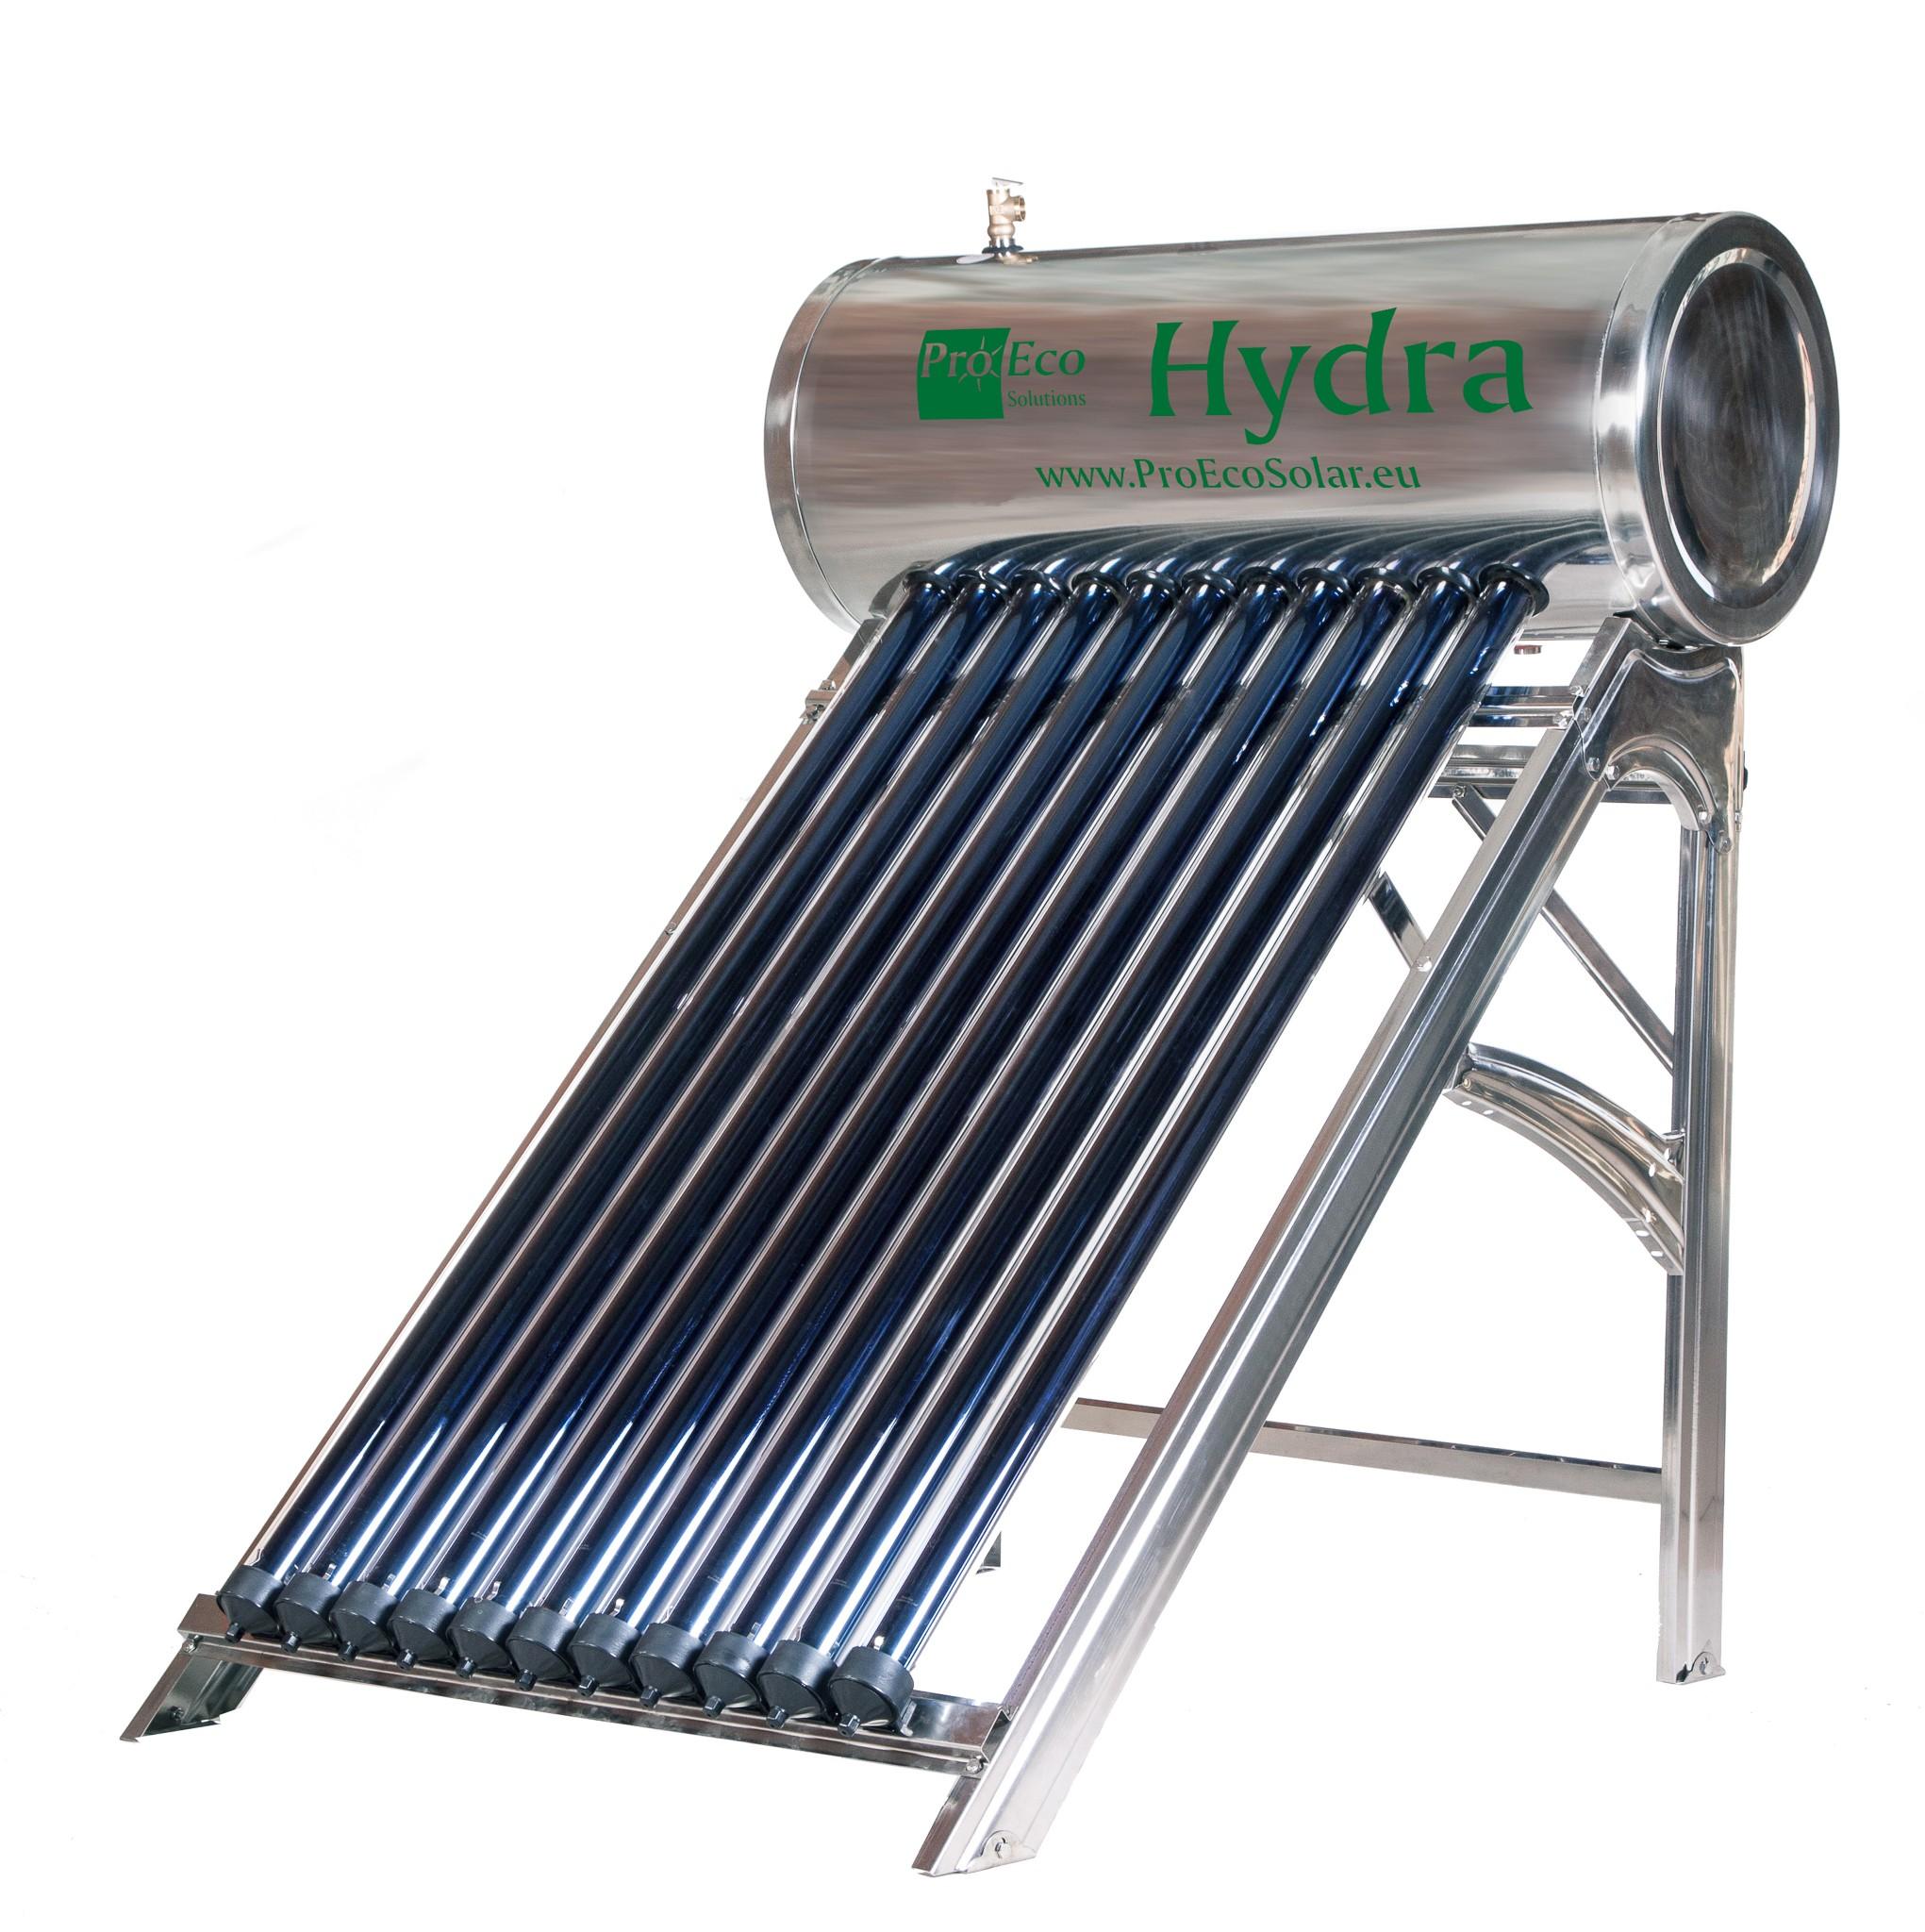 hydra water heater